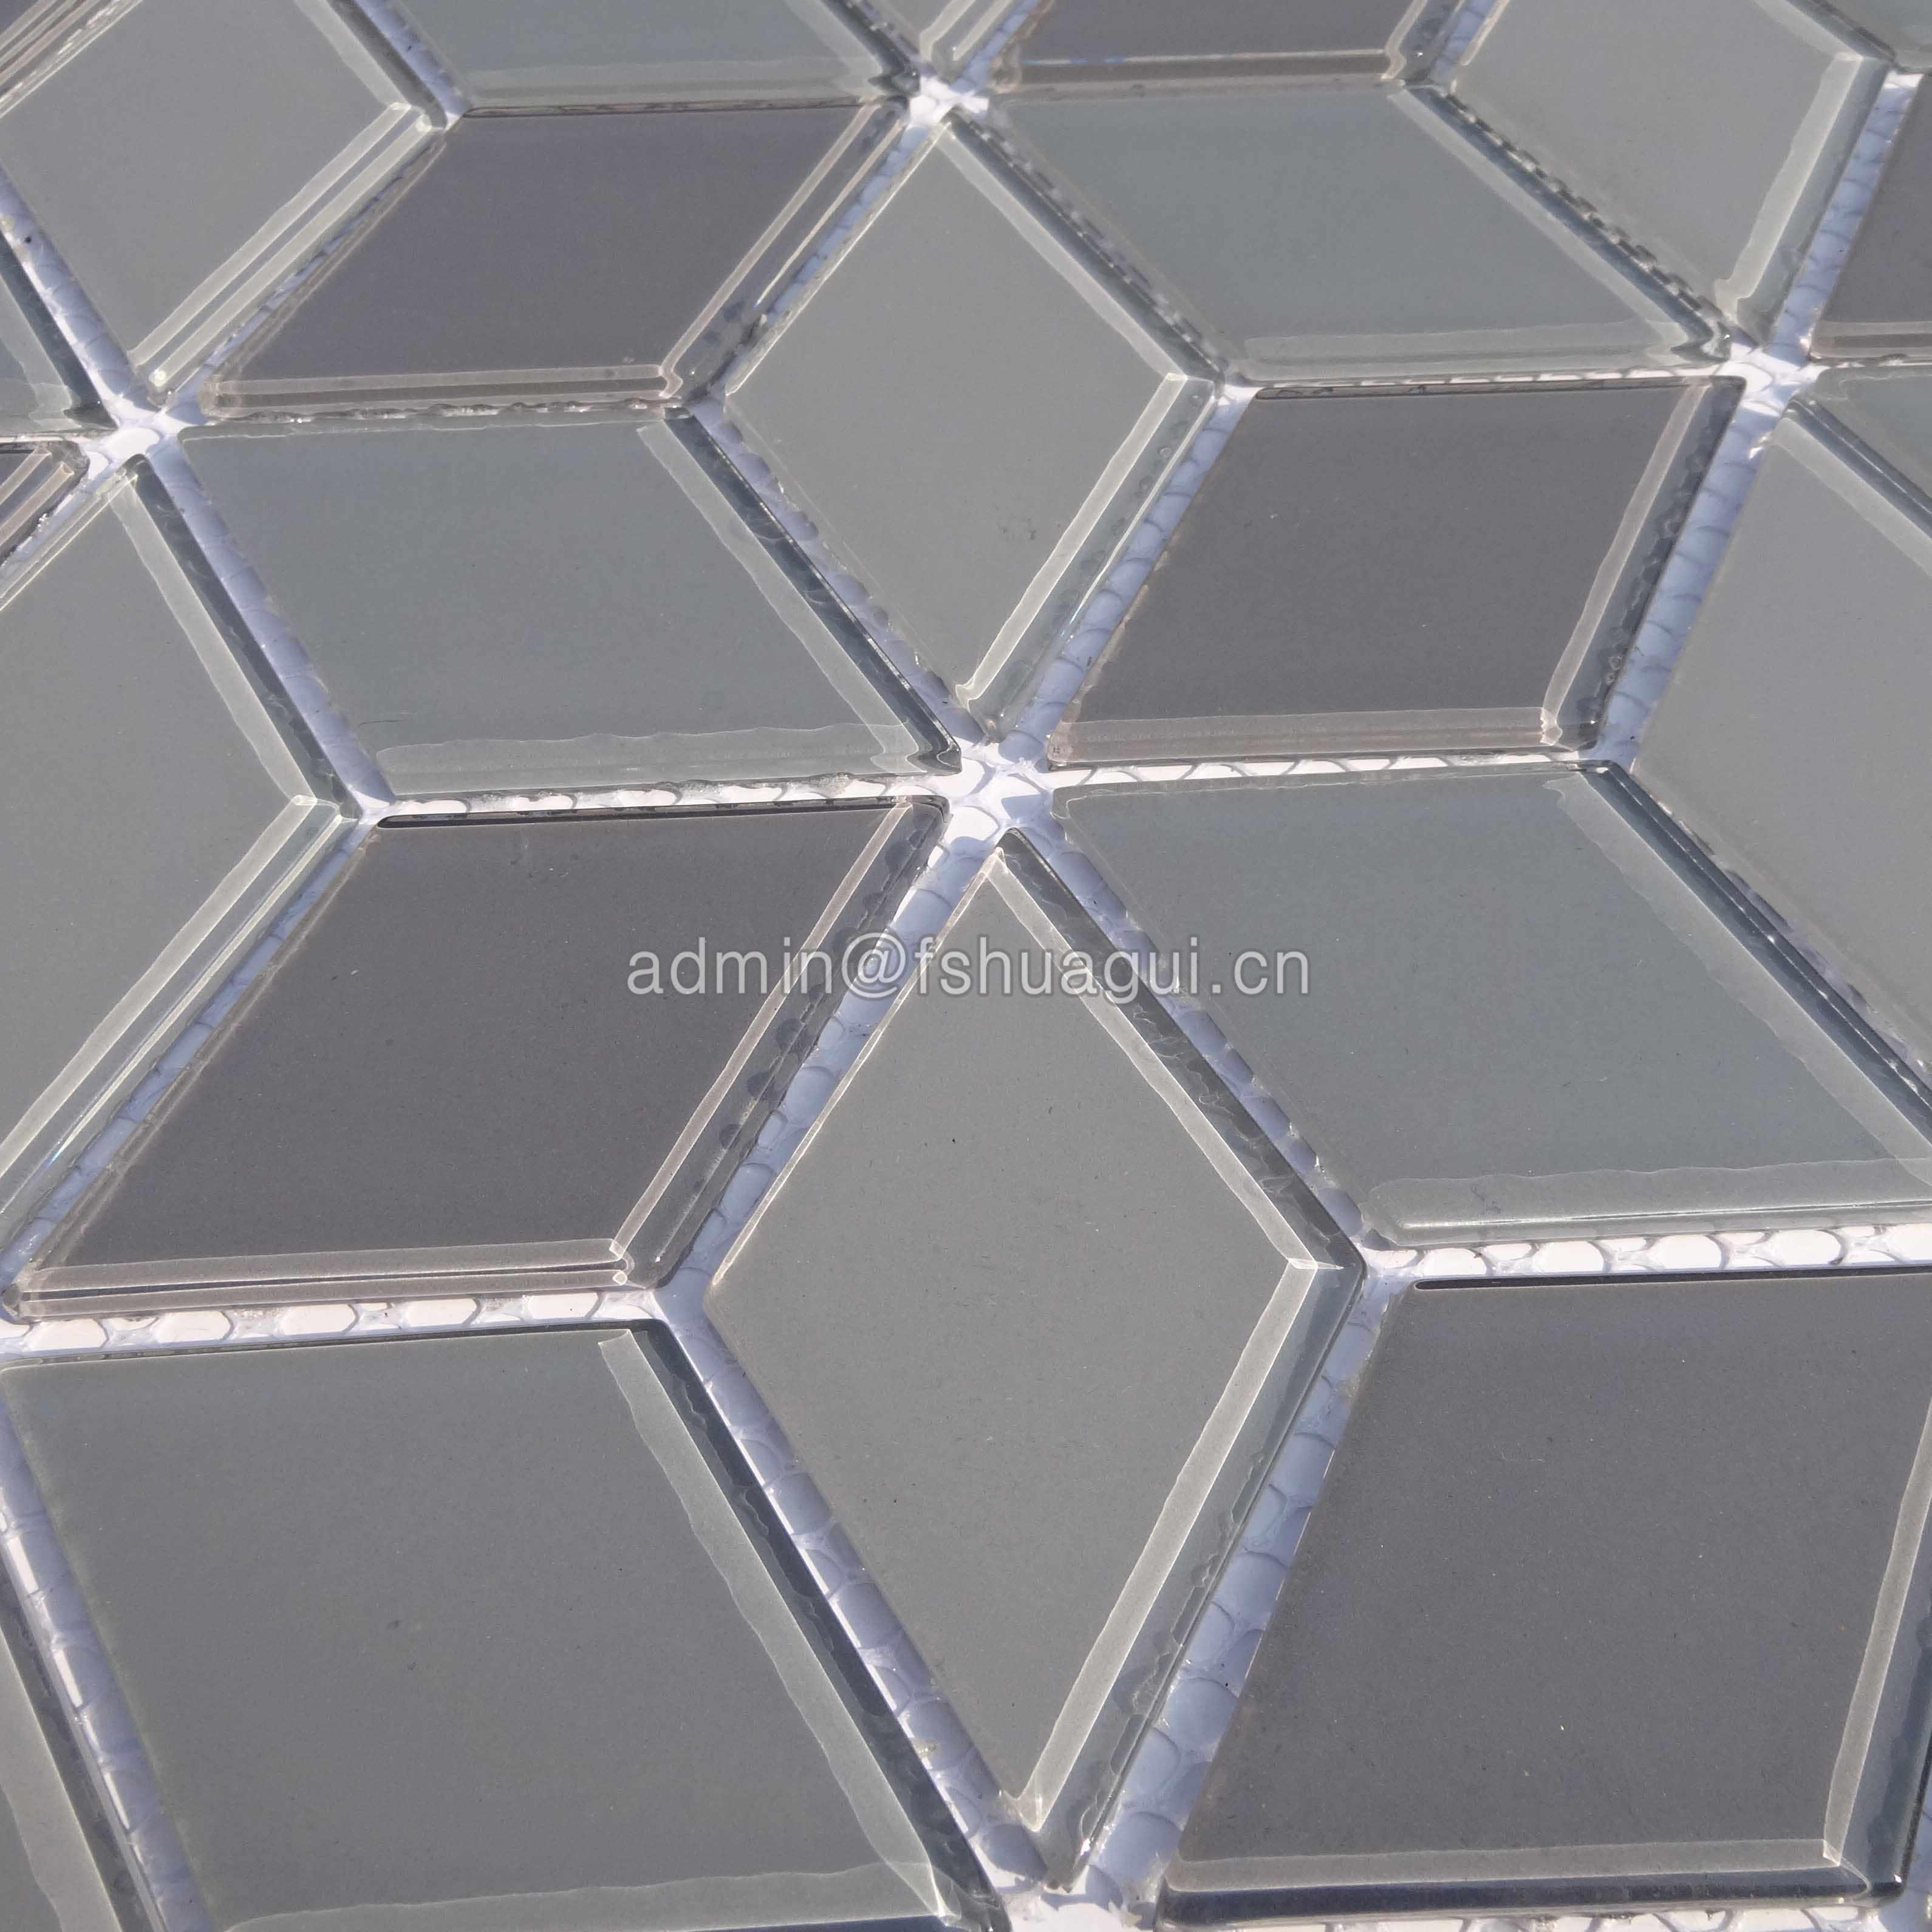 Huagui 3d presidio rhombus mosaic floor tile HG-YX004 GLASS MOSAIC TILE image70